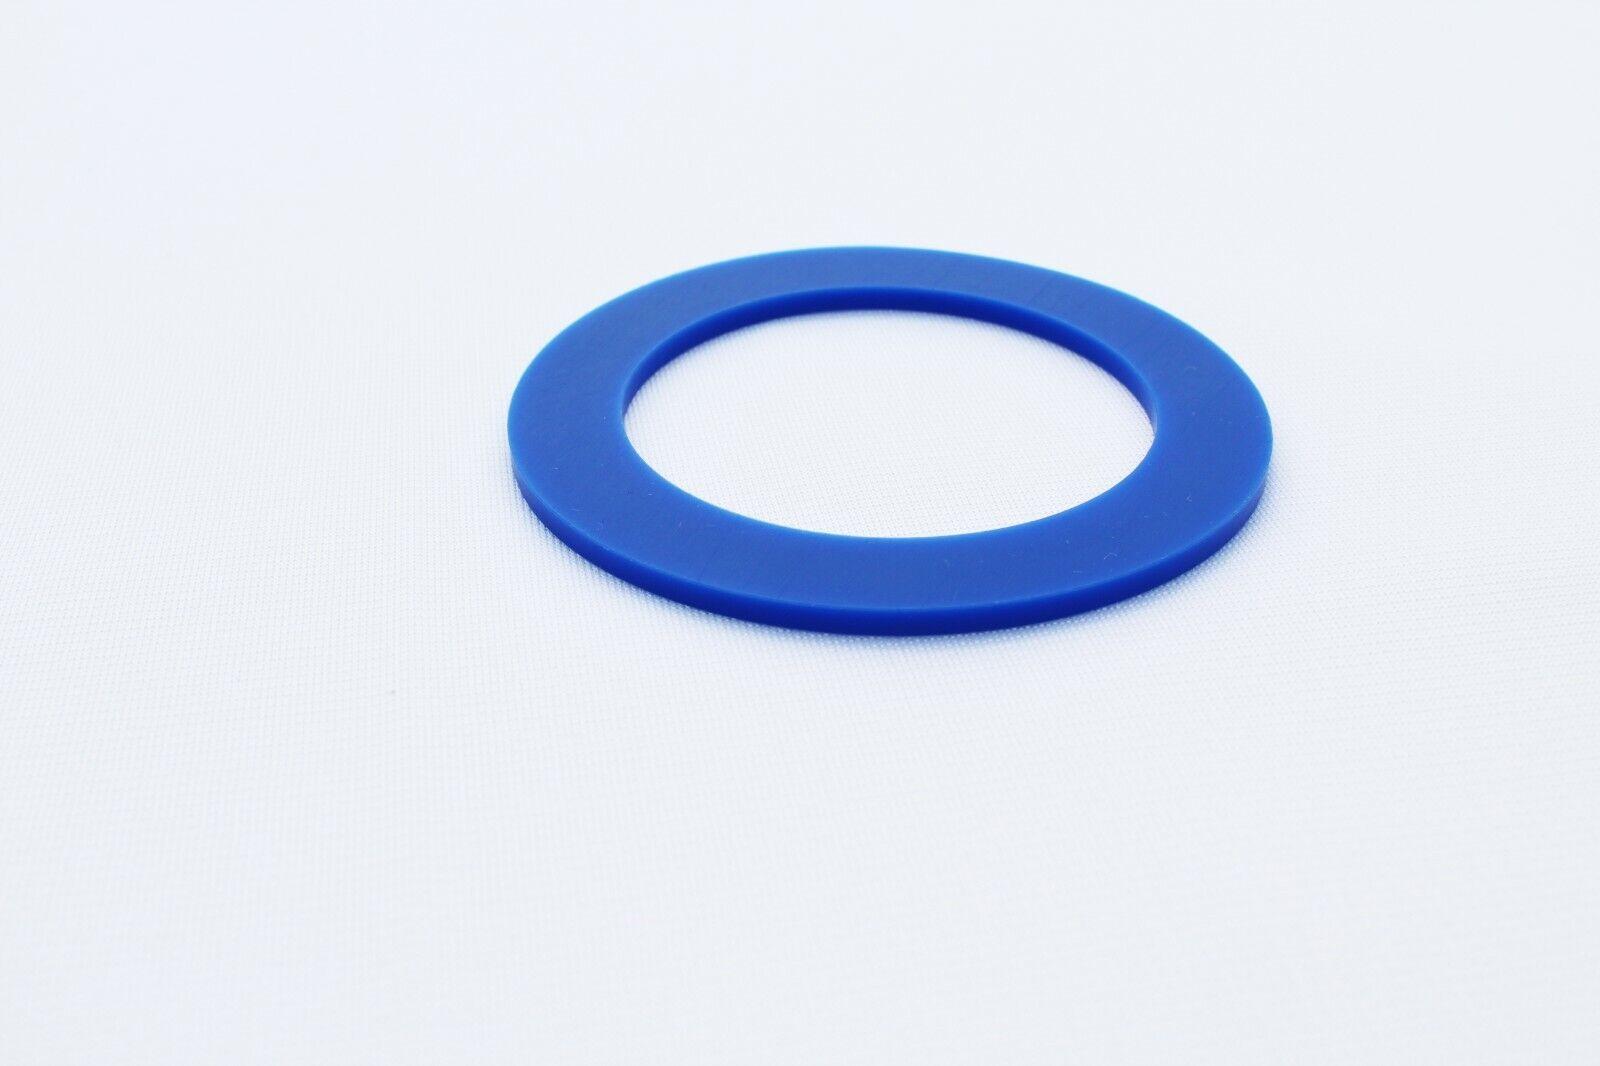 BLUE WHALE Return Jet Gaskets (Qty 2), Navy Grip Seal – Never Leak Pool Liner Home & Garden